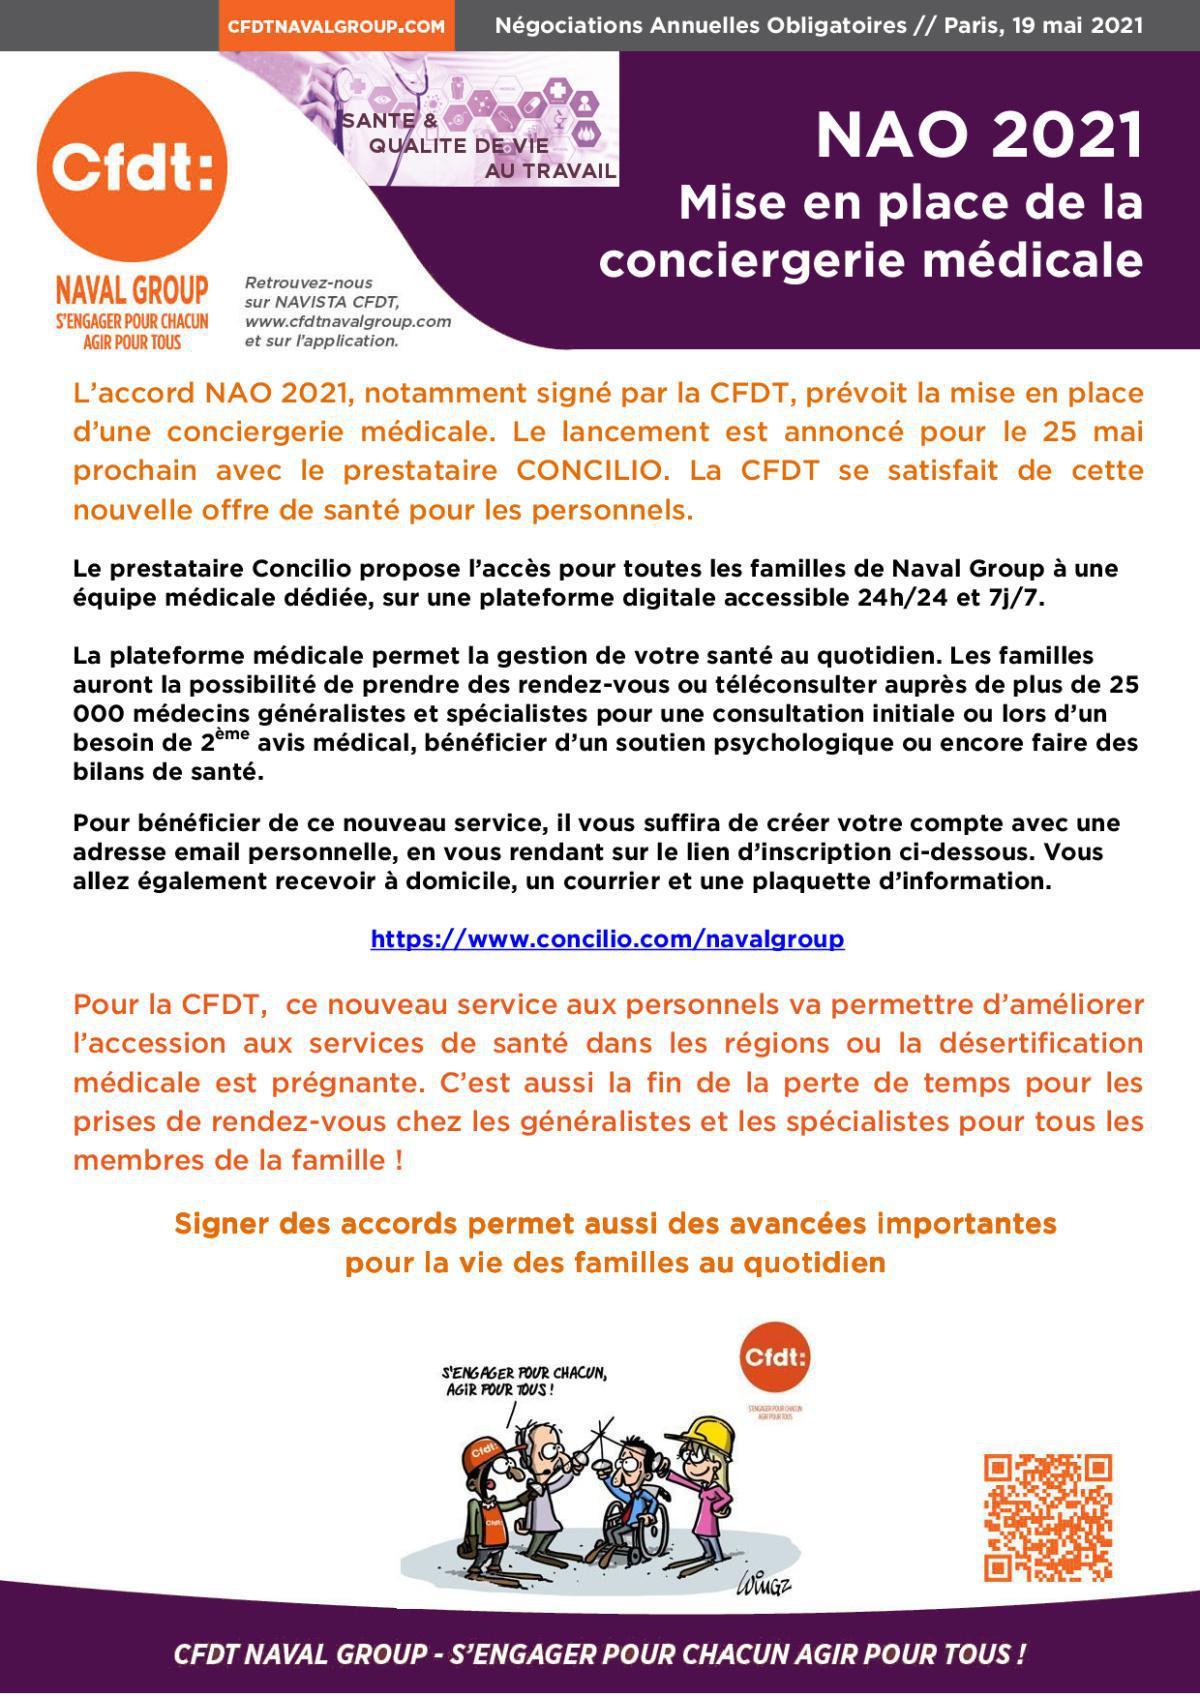 NAO 2021 : Conciergerie médicale